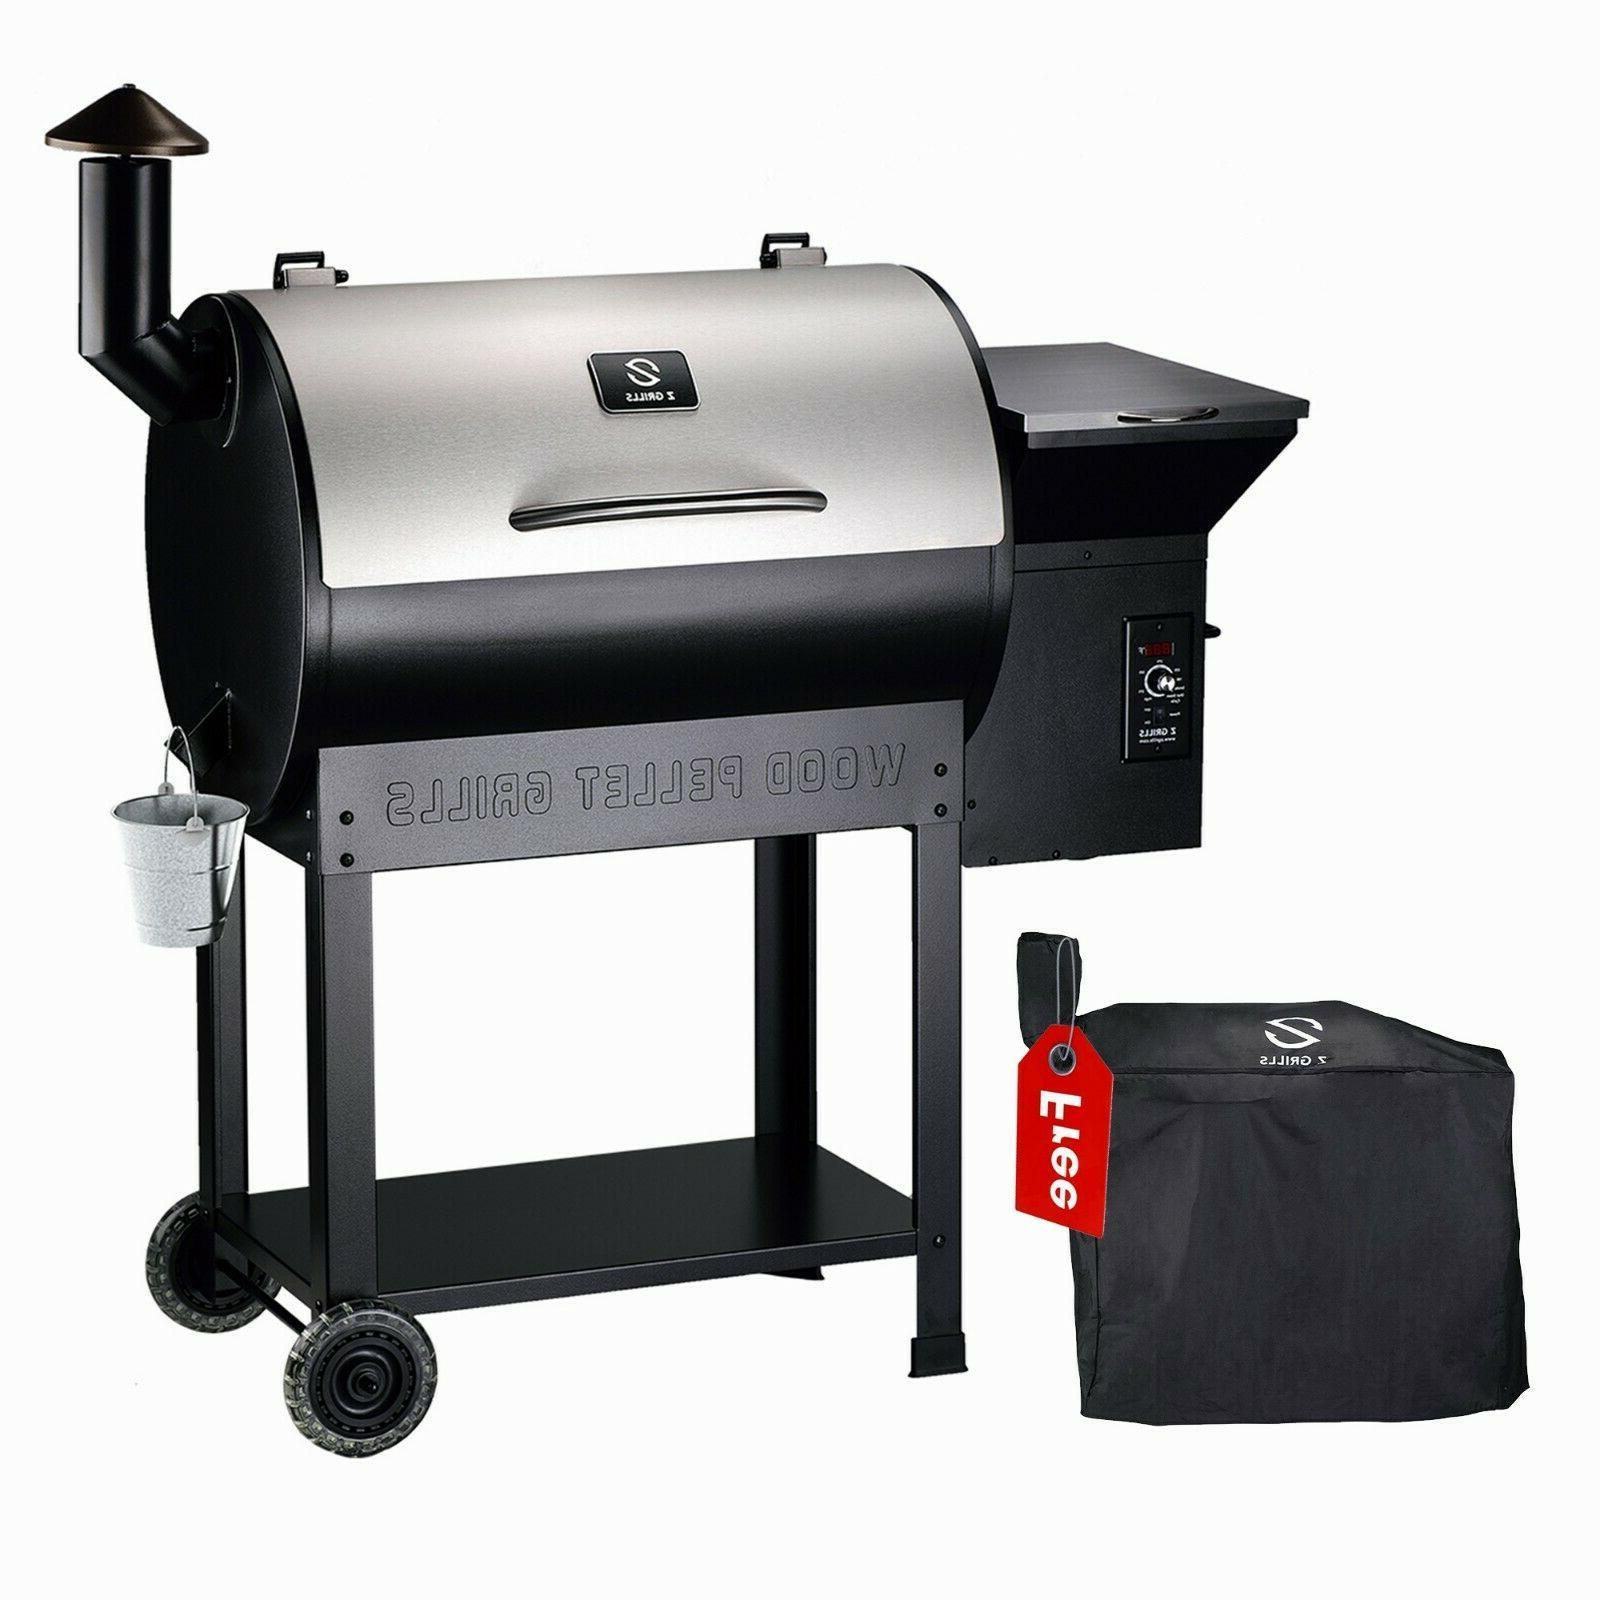 Z Grills Pellet Grill Outdoor Bbq Smoker 2019